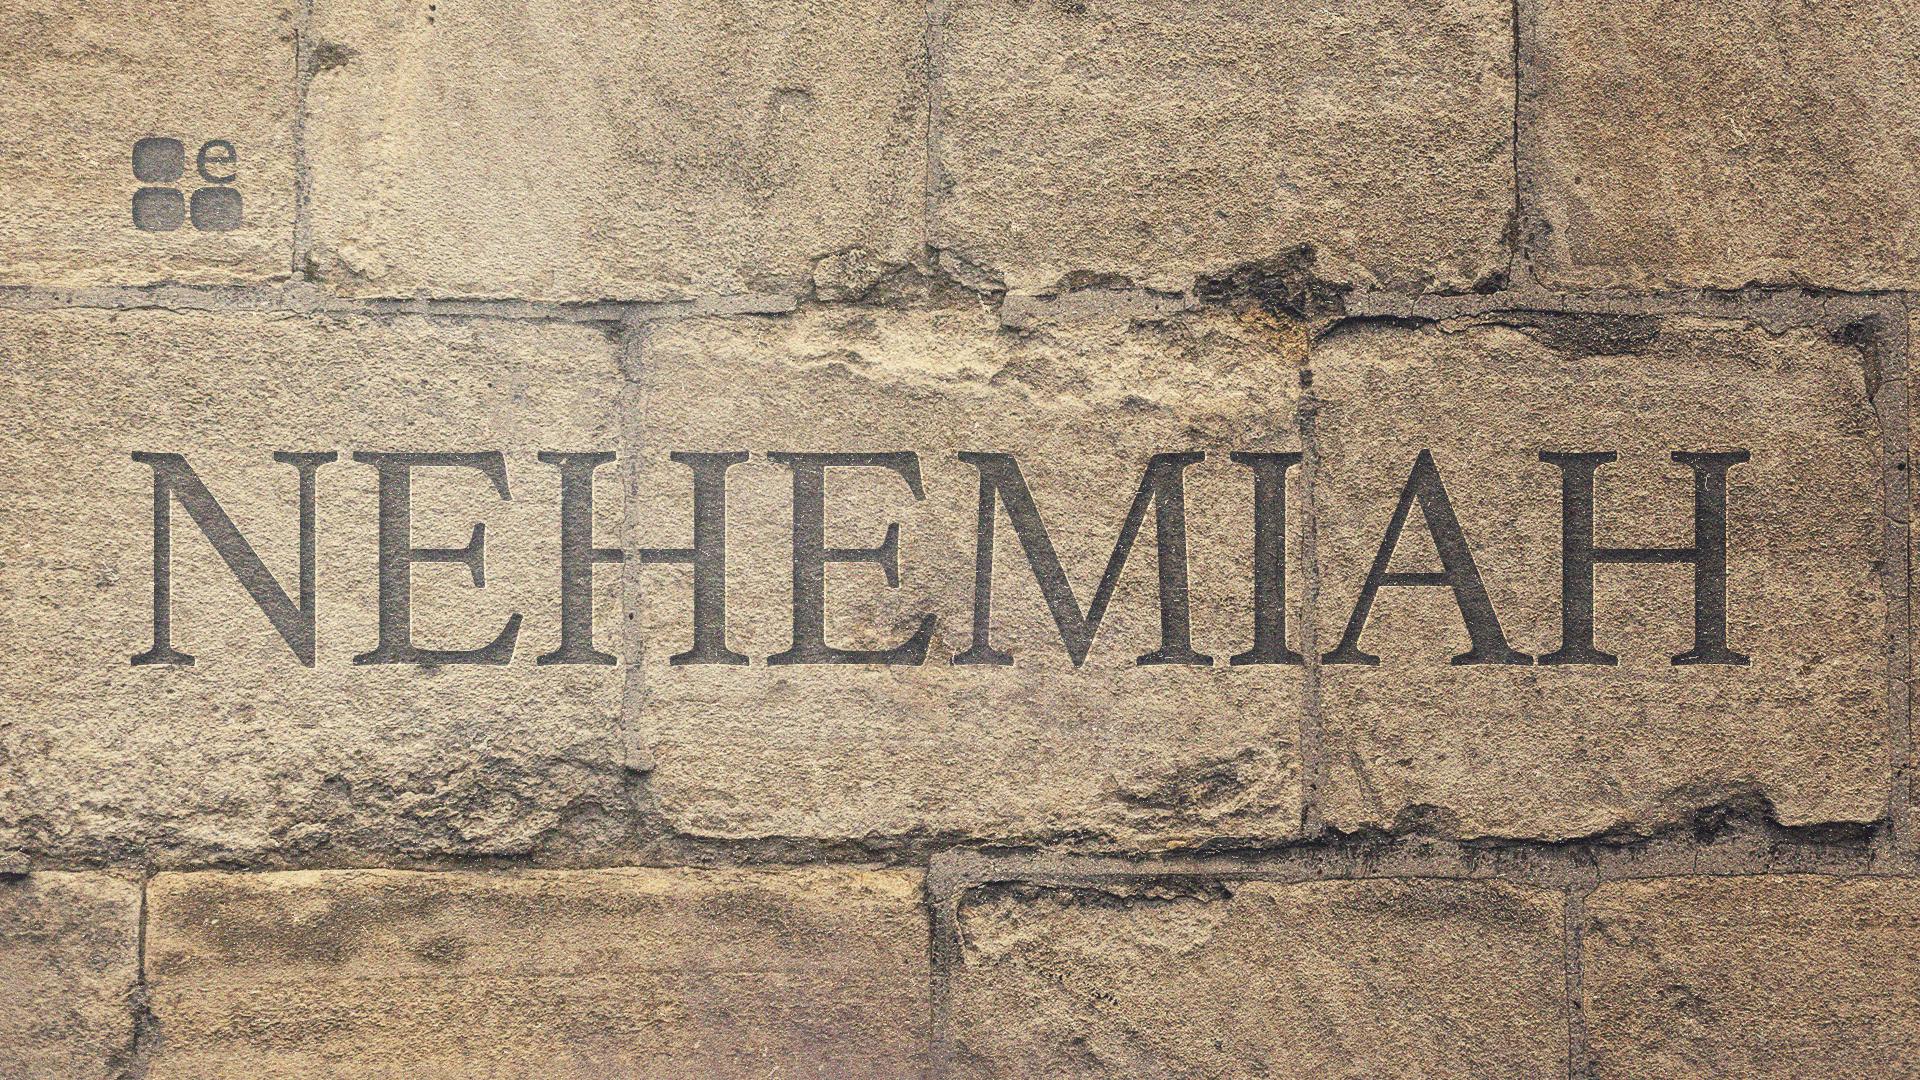 Nehemiah-Series.jpg